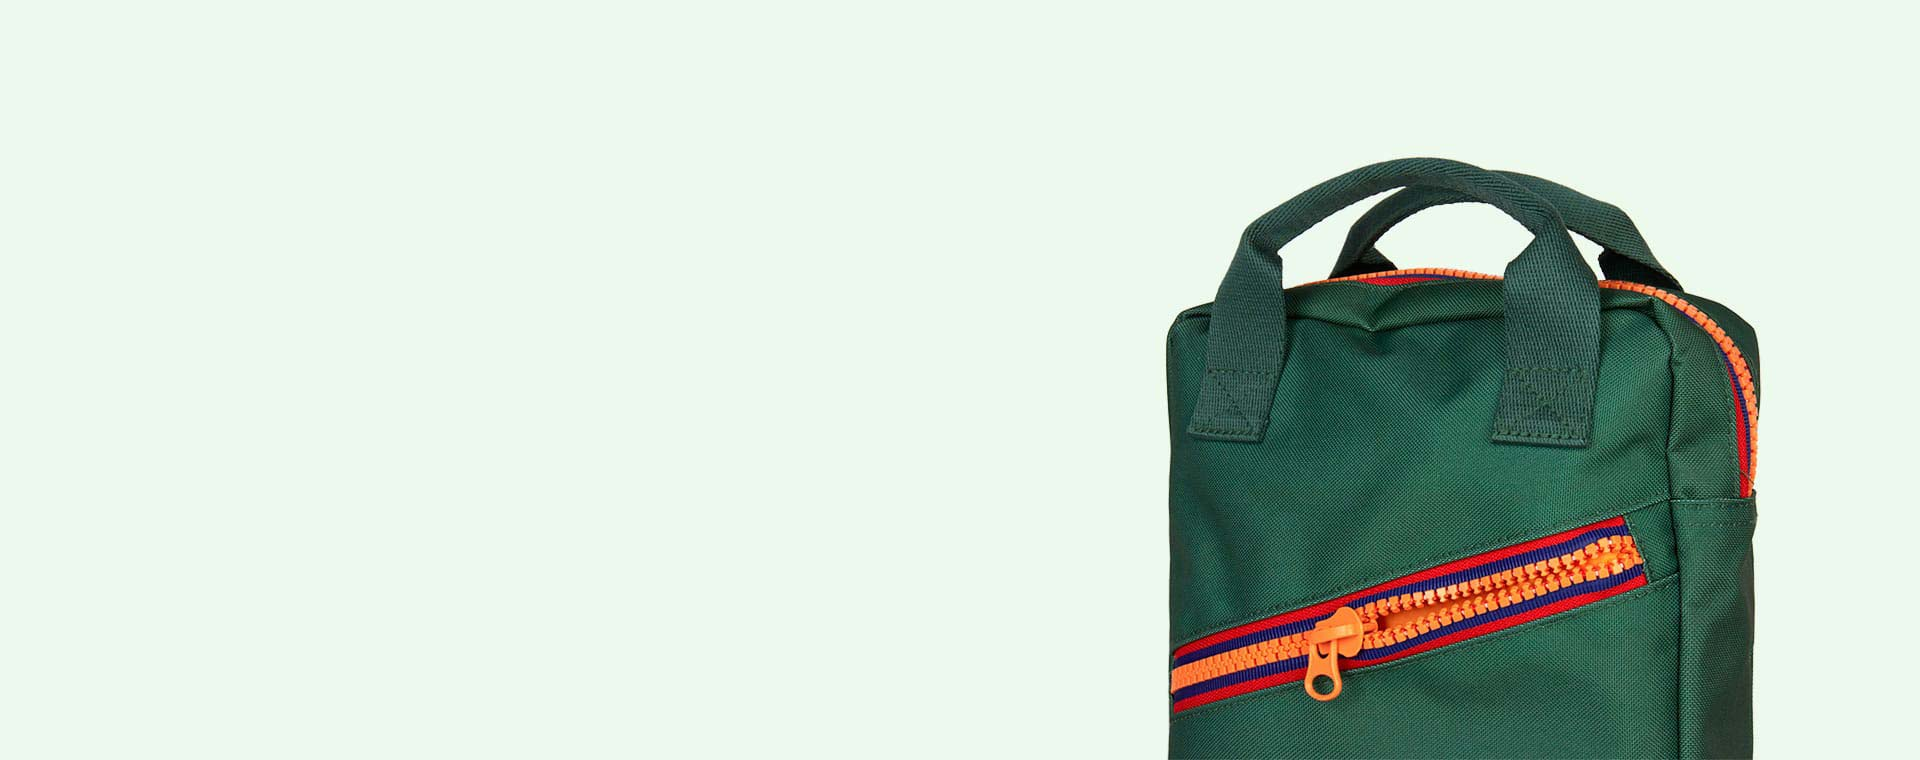 Green Engel Zipper Backpack